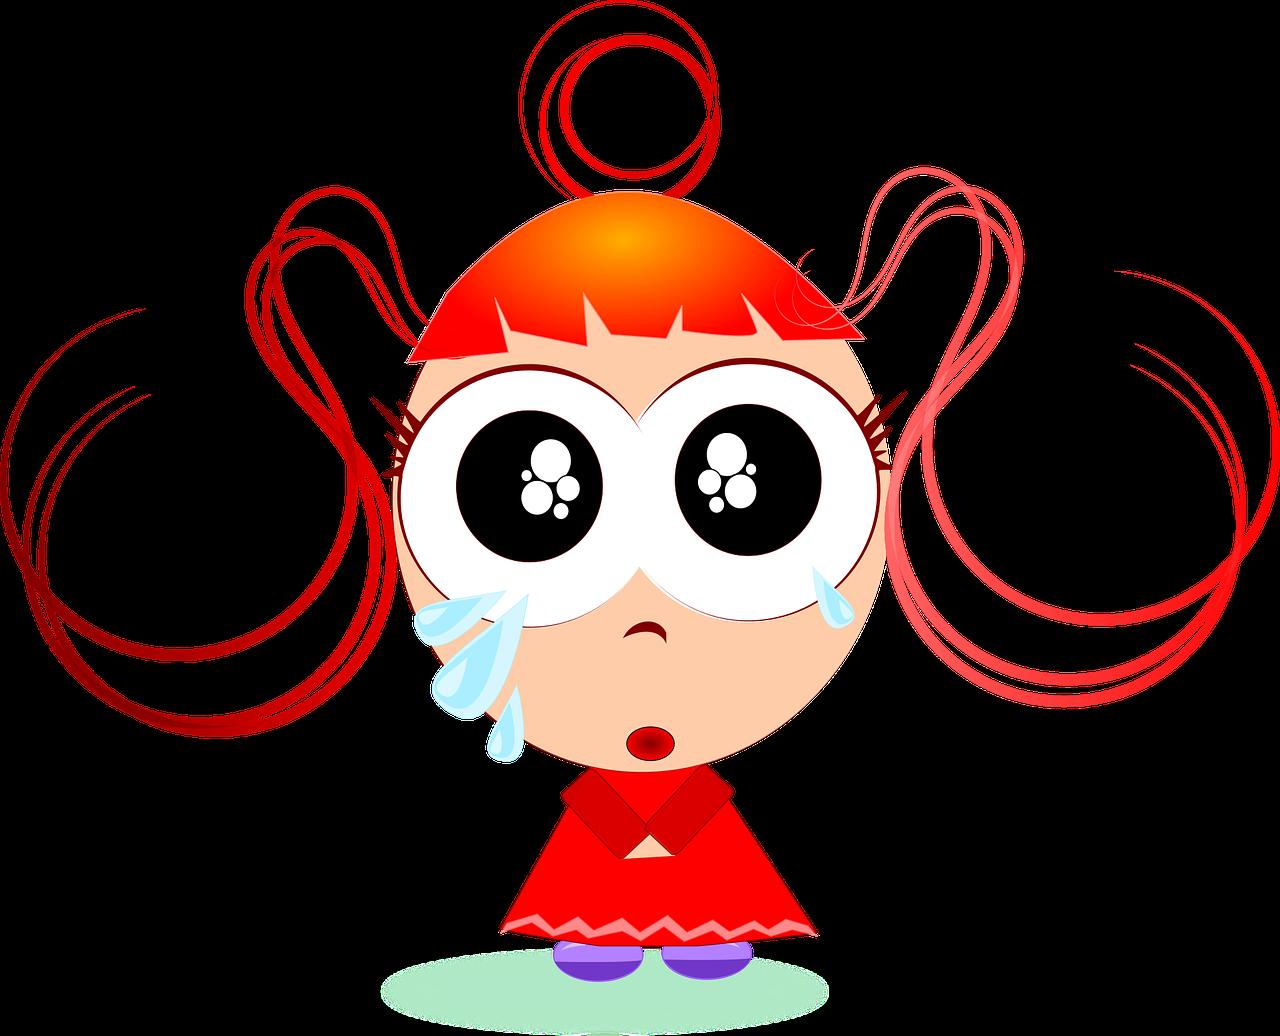 Gadis Sedih Kartun Gambar Vektor Gratis Di Pixabay